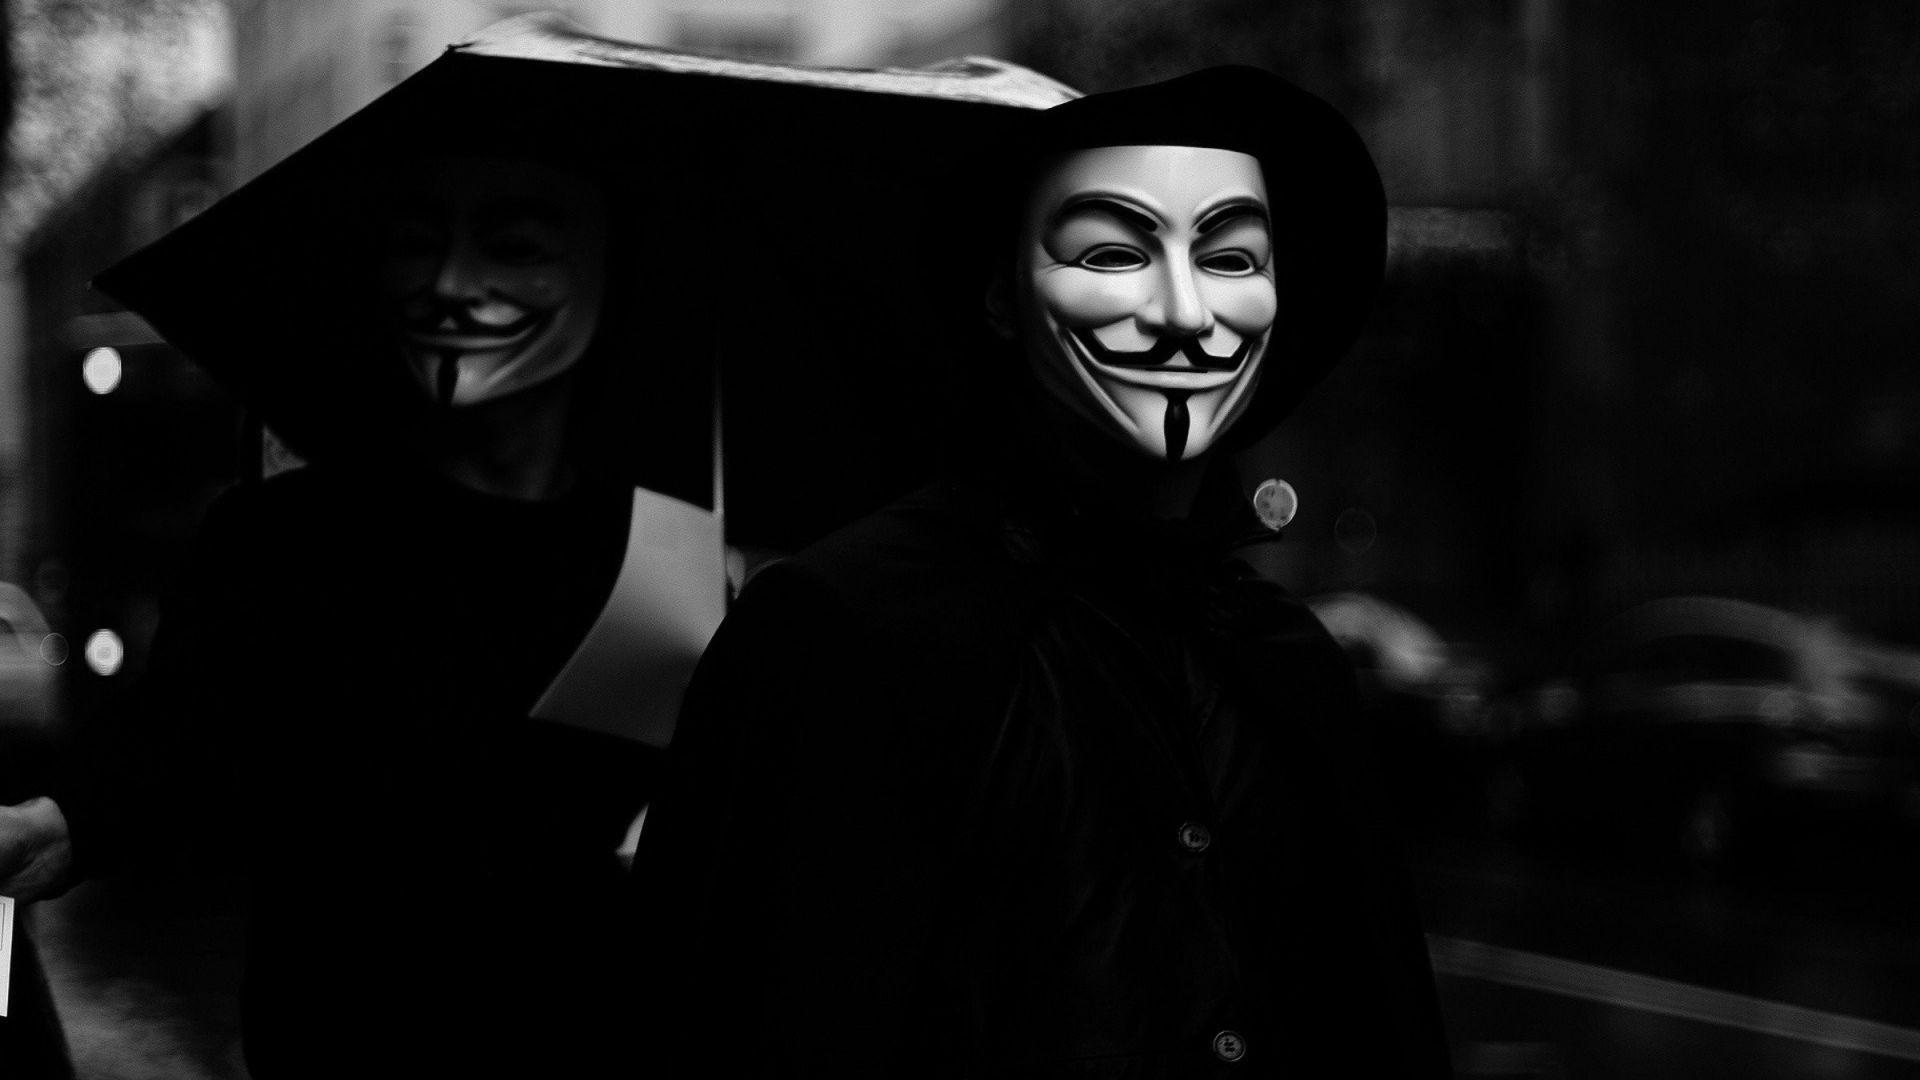 V For Vendetta Mask Wallpaper Army Desktop Wallpaper V Fo...